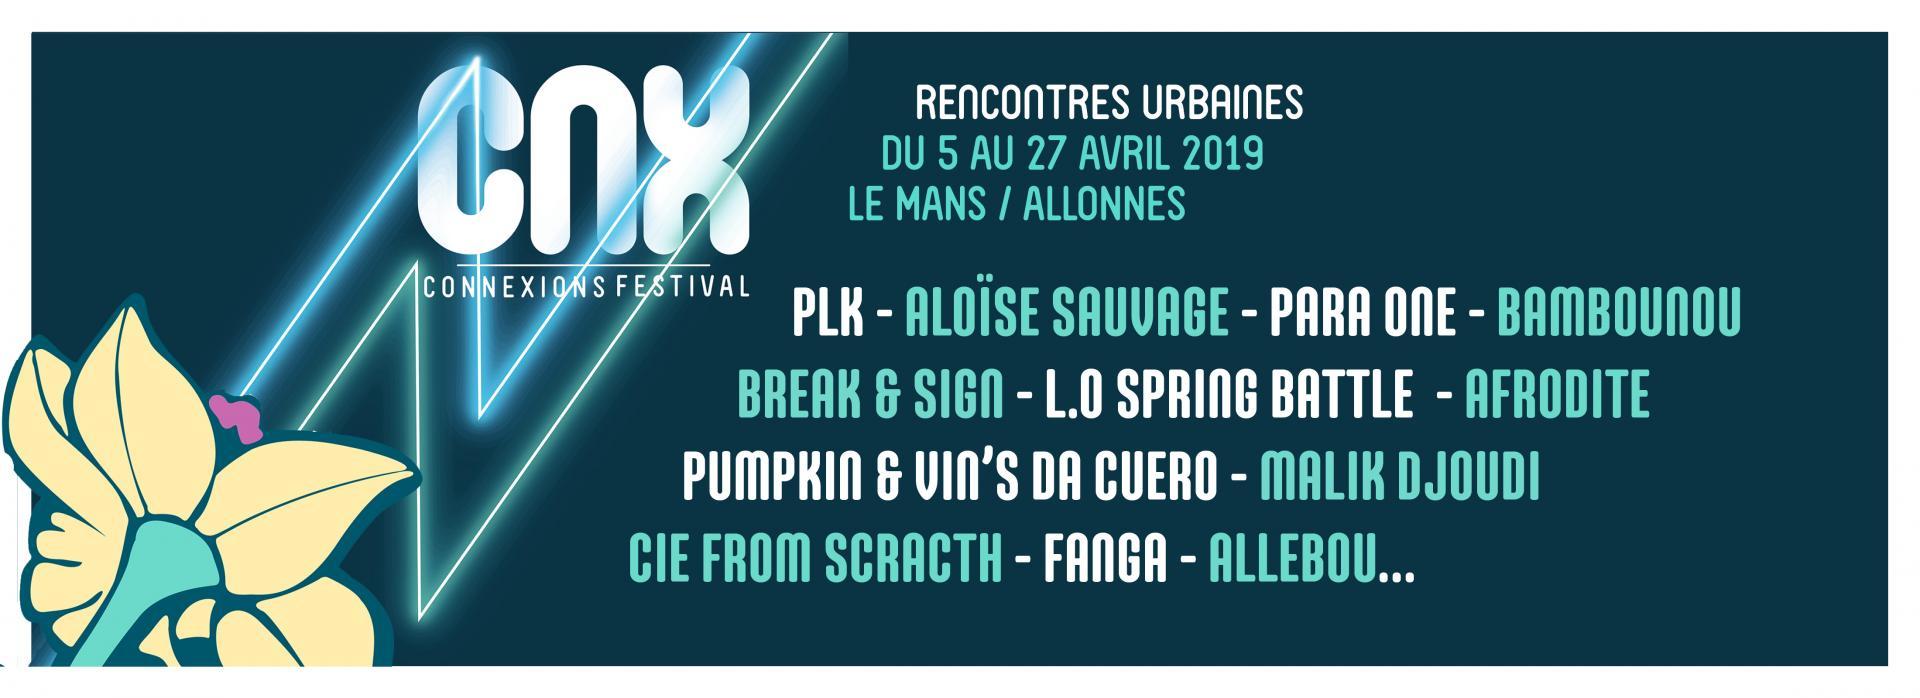 Bandeau cnx 2019-1